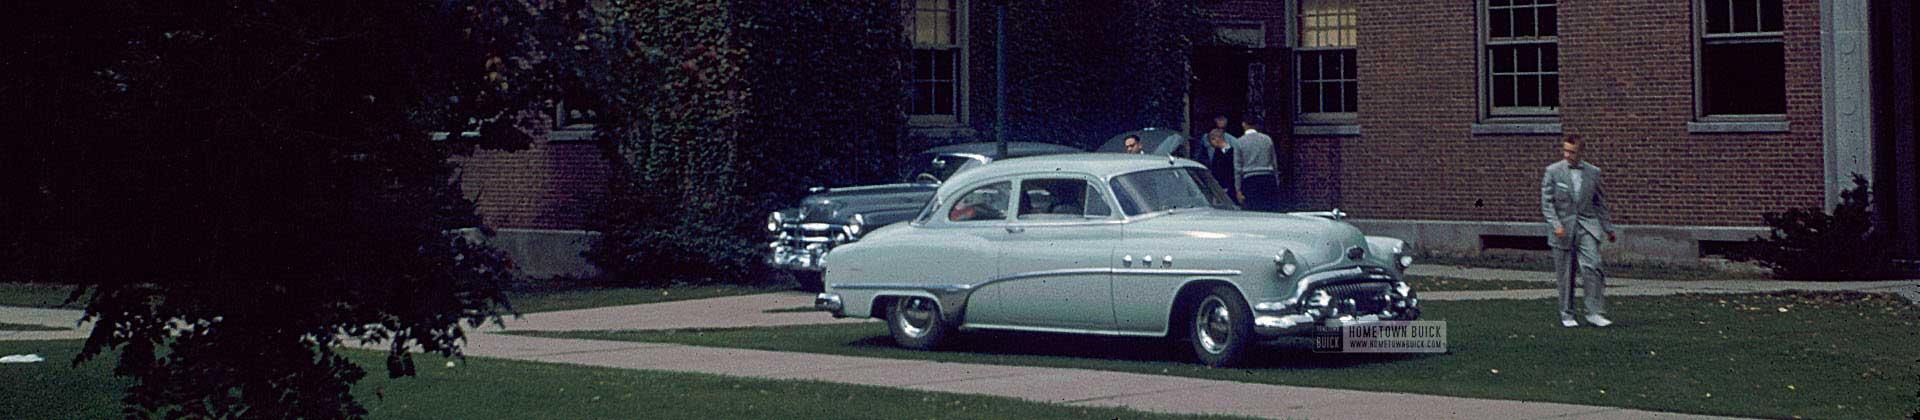 1951 Buick Slider